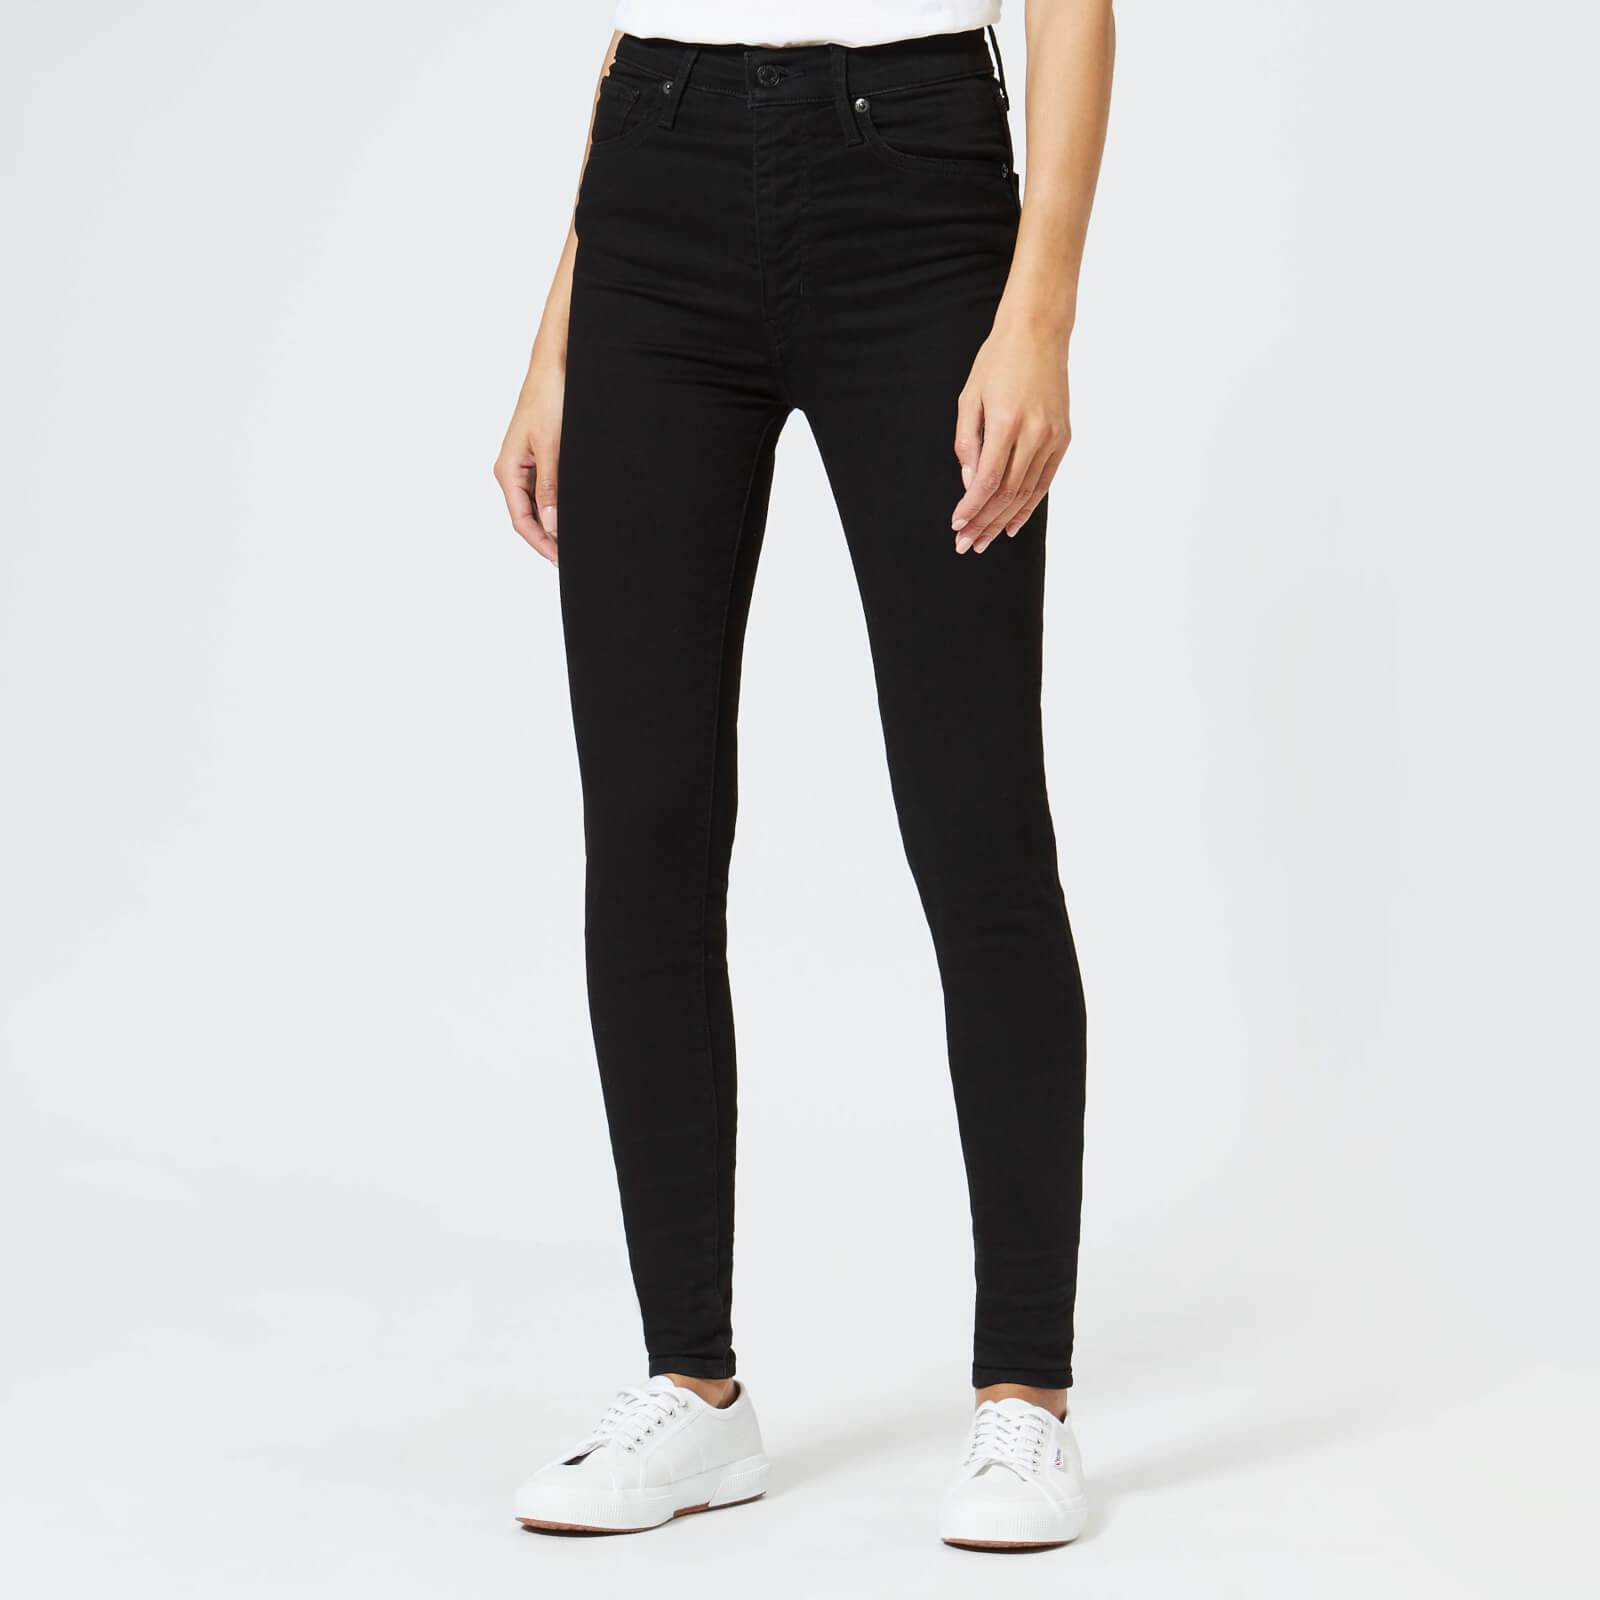 Levi's s Mile High Super Skinny Jeans - Black Galaxy - W26/L30